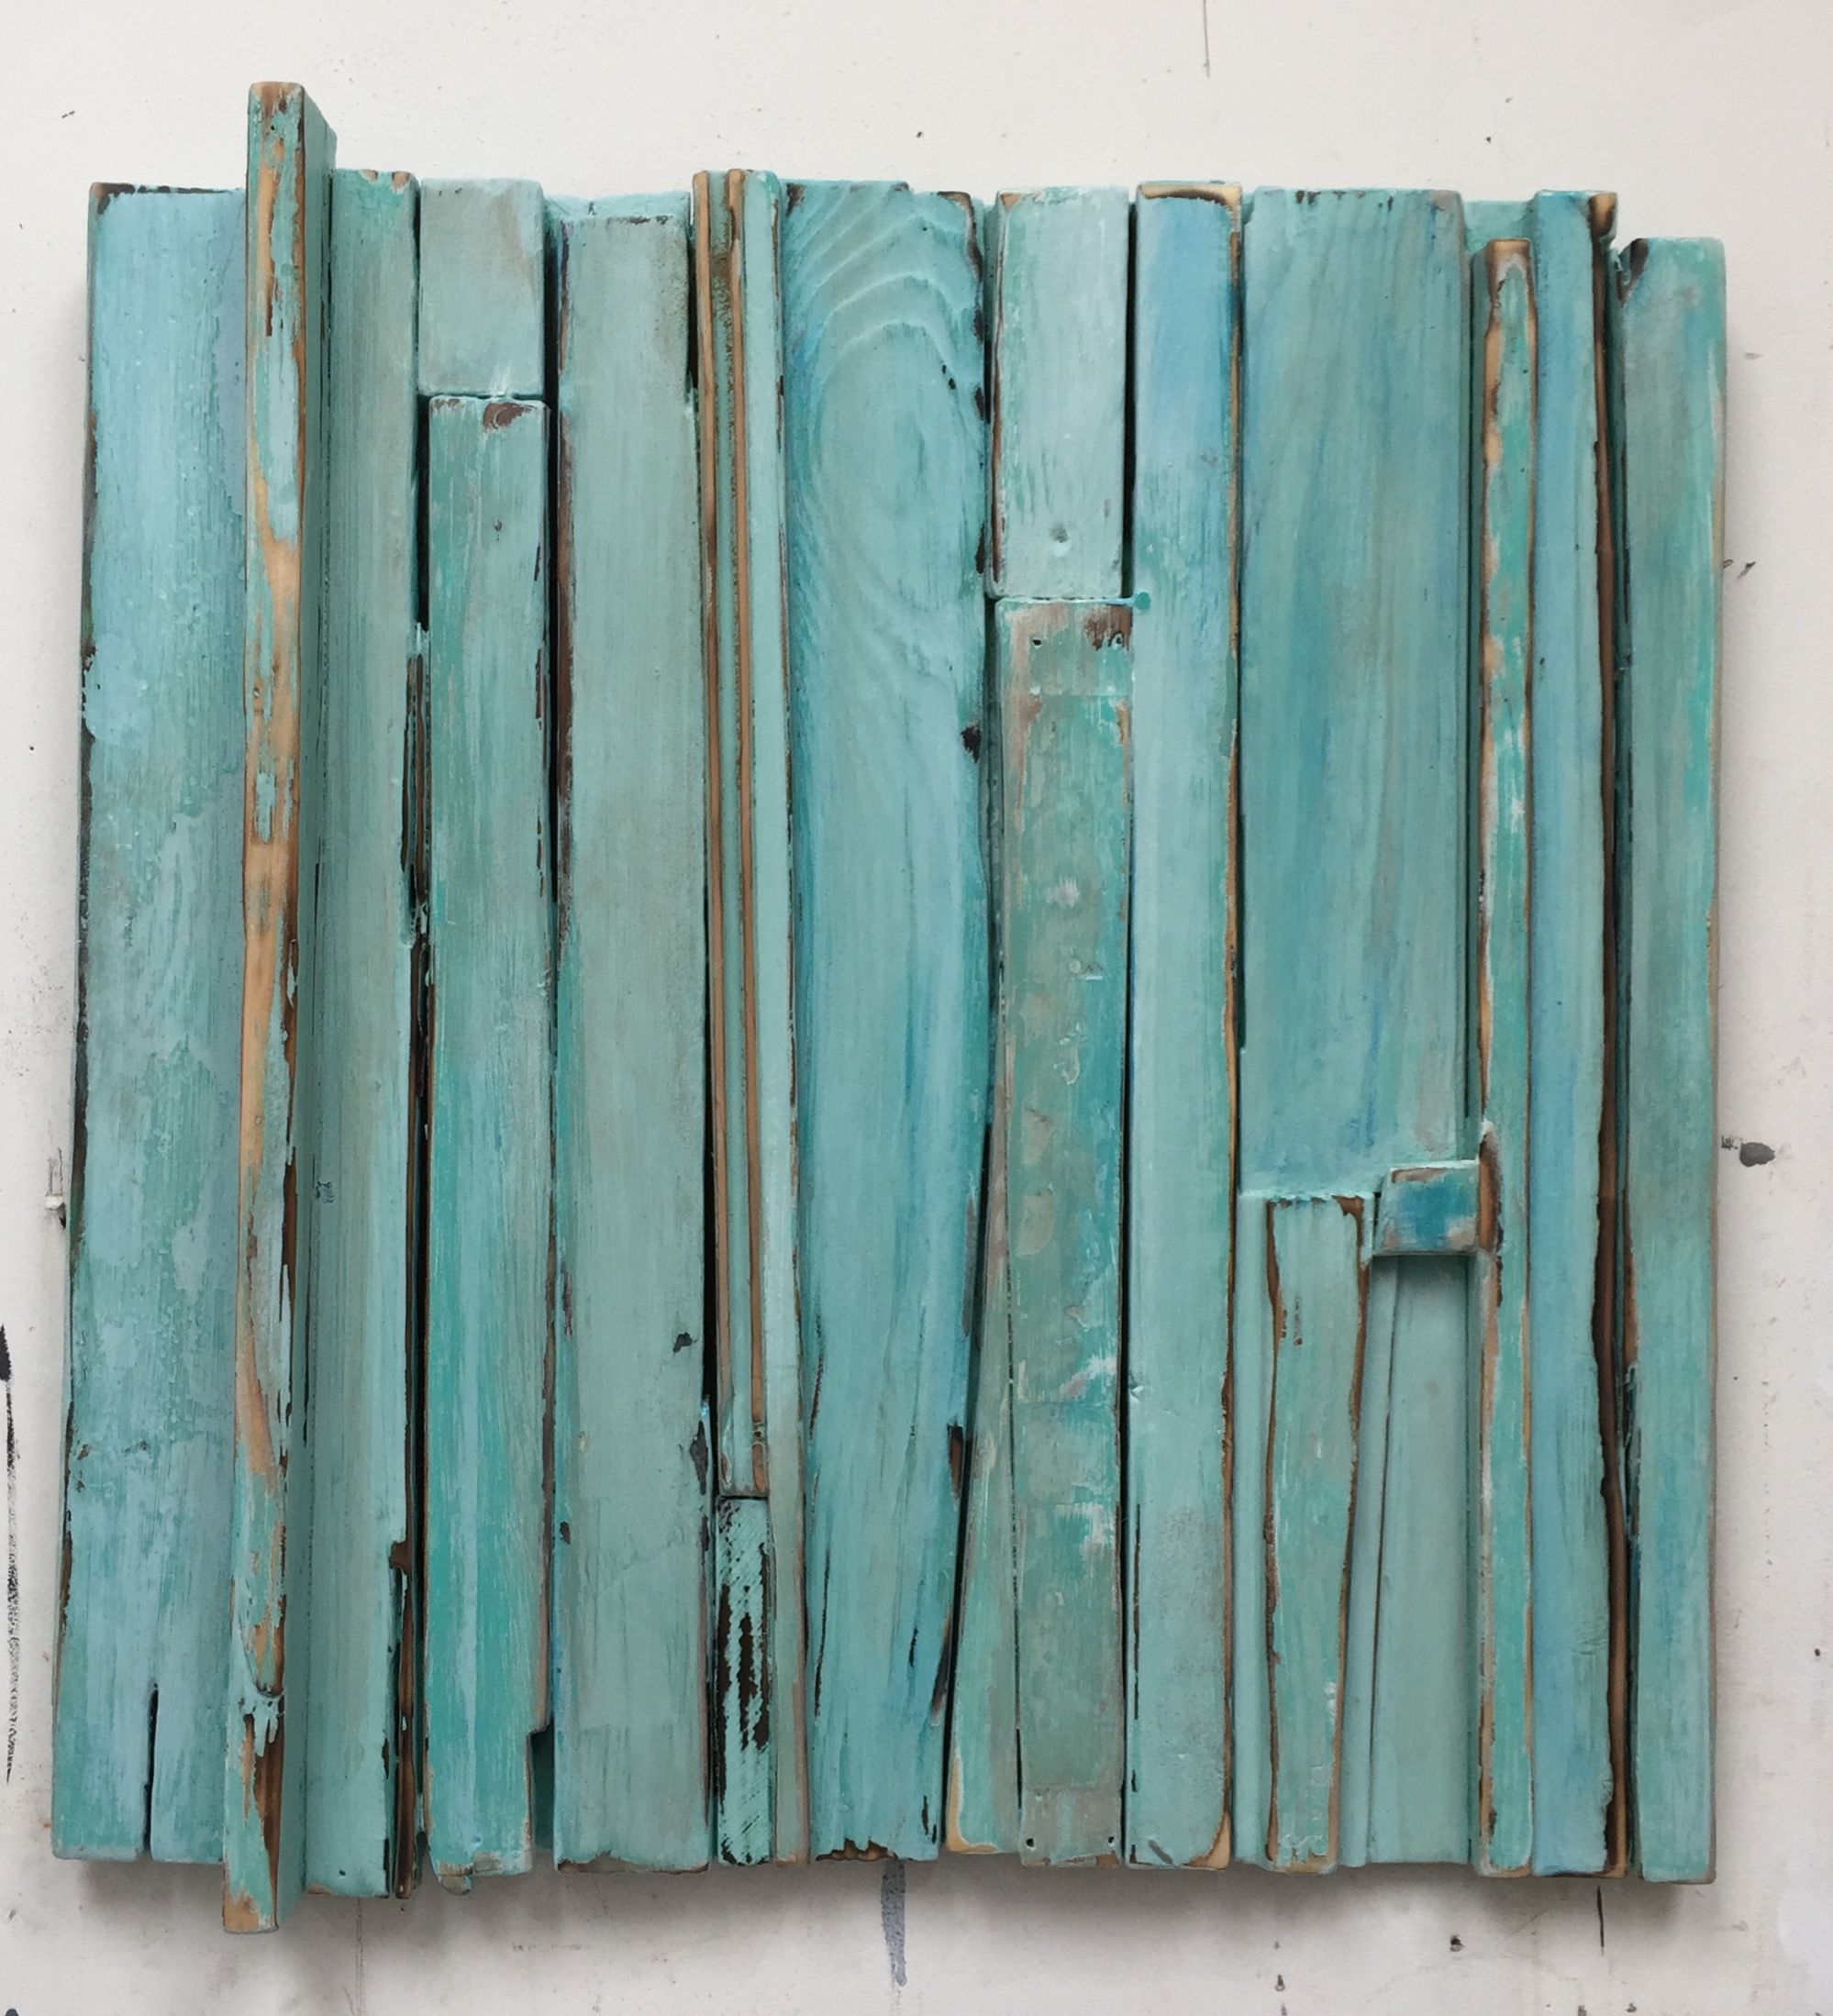 Weathered Turquoise, 2016, acrylic on layered wood, 25 x 23 in, $3,500